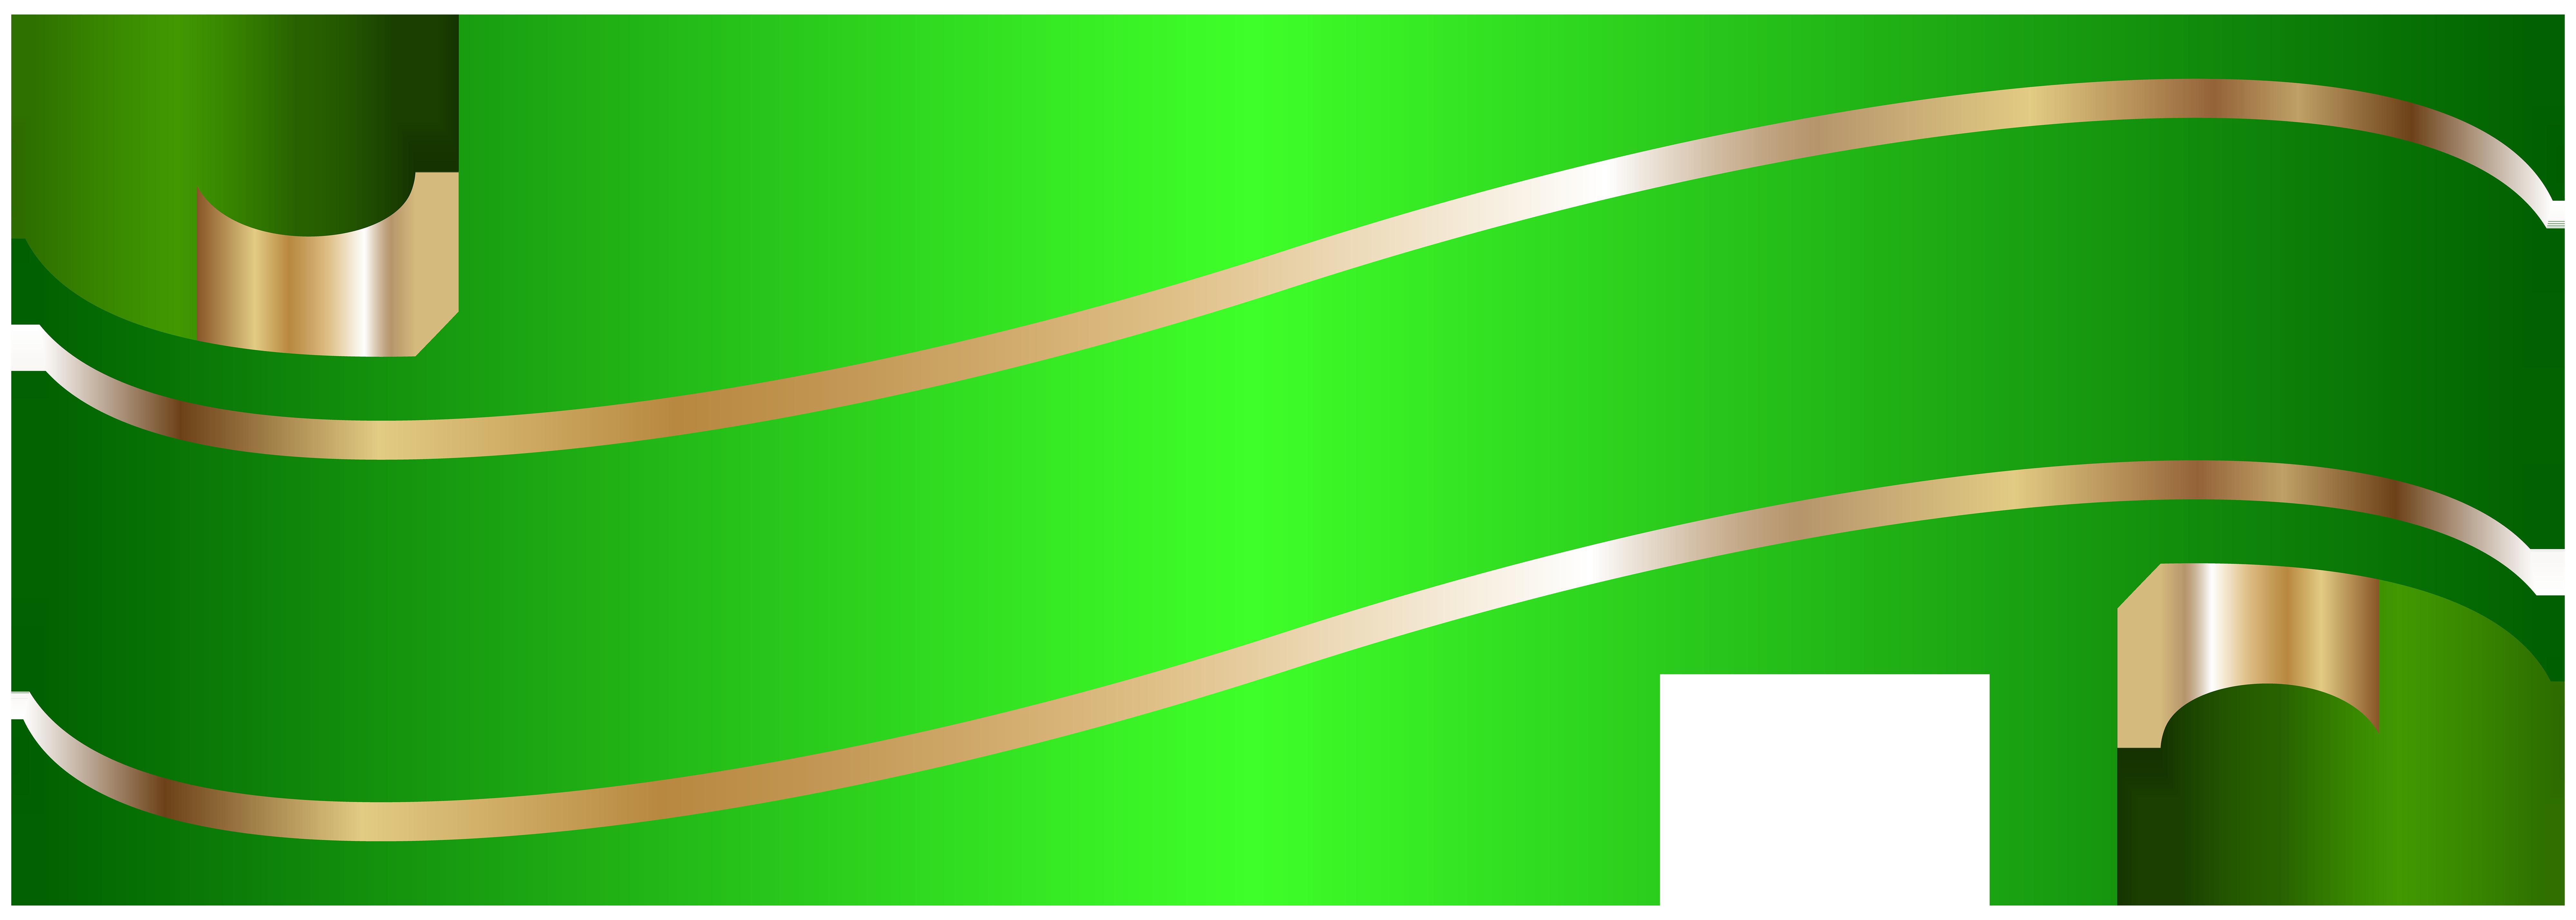 Watermelon clipart banner. Elegant green png clip